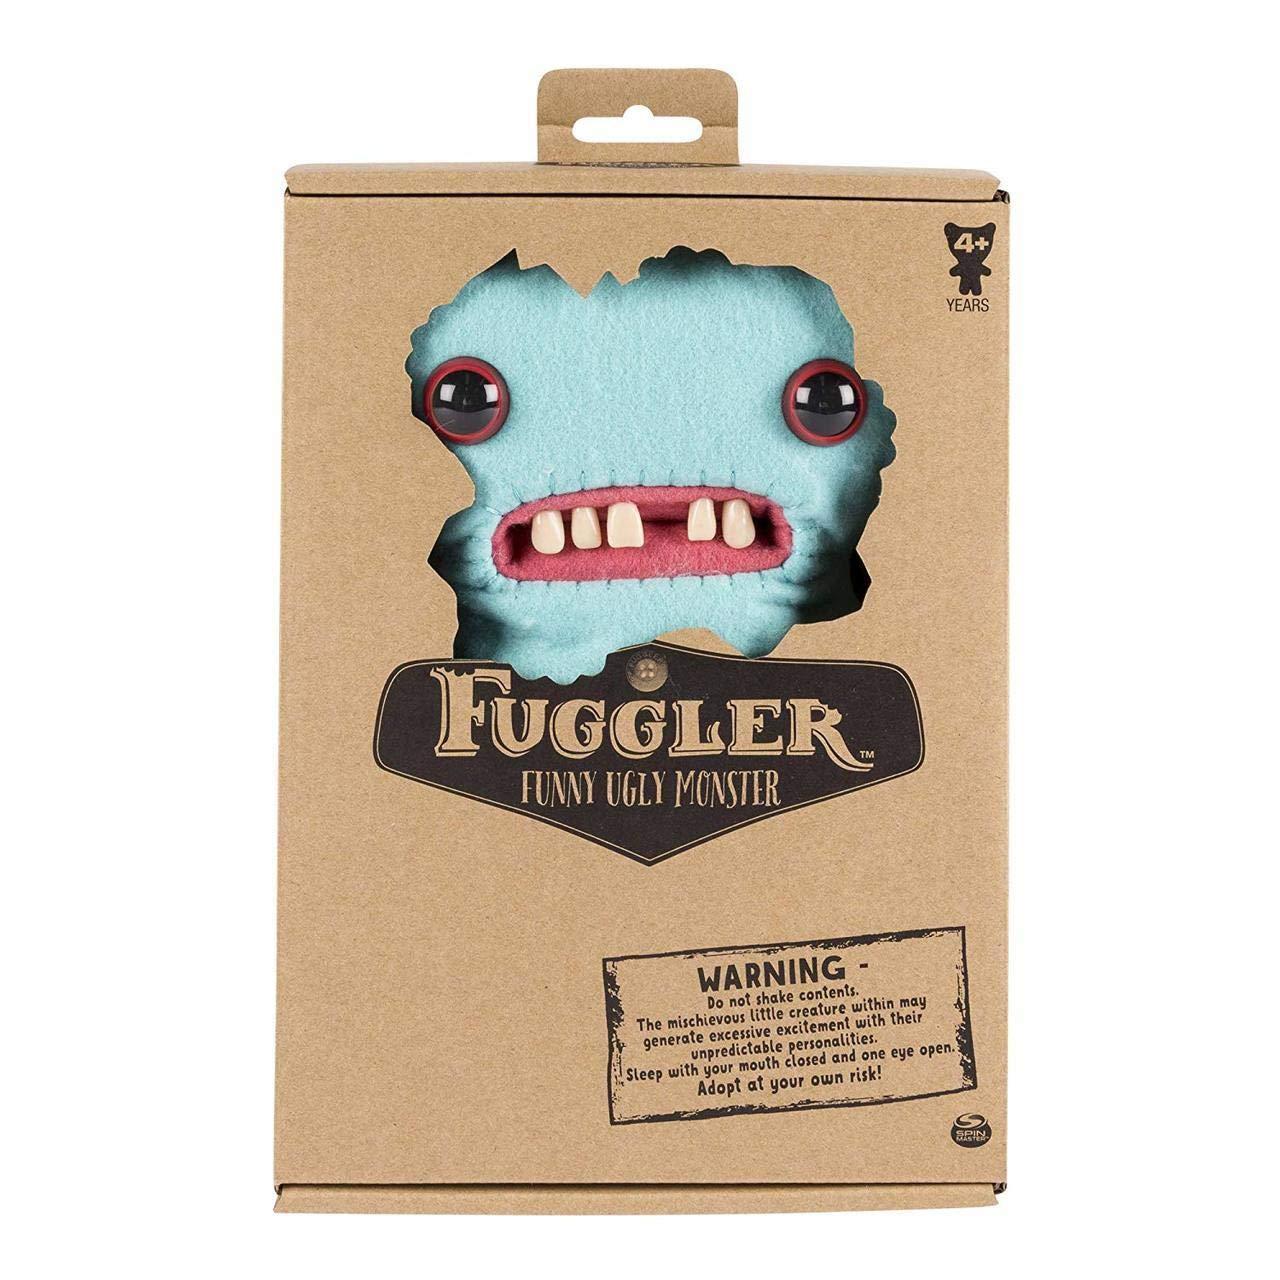 Spin Master Fuggler Funny Ugly Monster Deluxe Stuffed Little Nighmares Region 3 Animal Medium 9 Plush Sasquoosh Toys Games